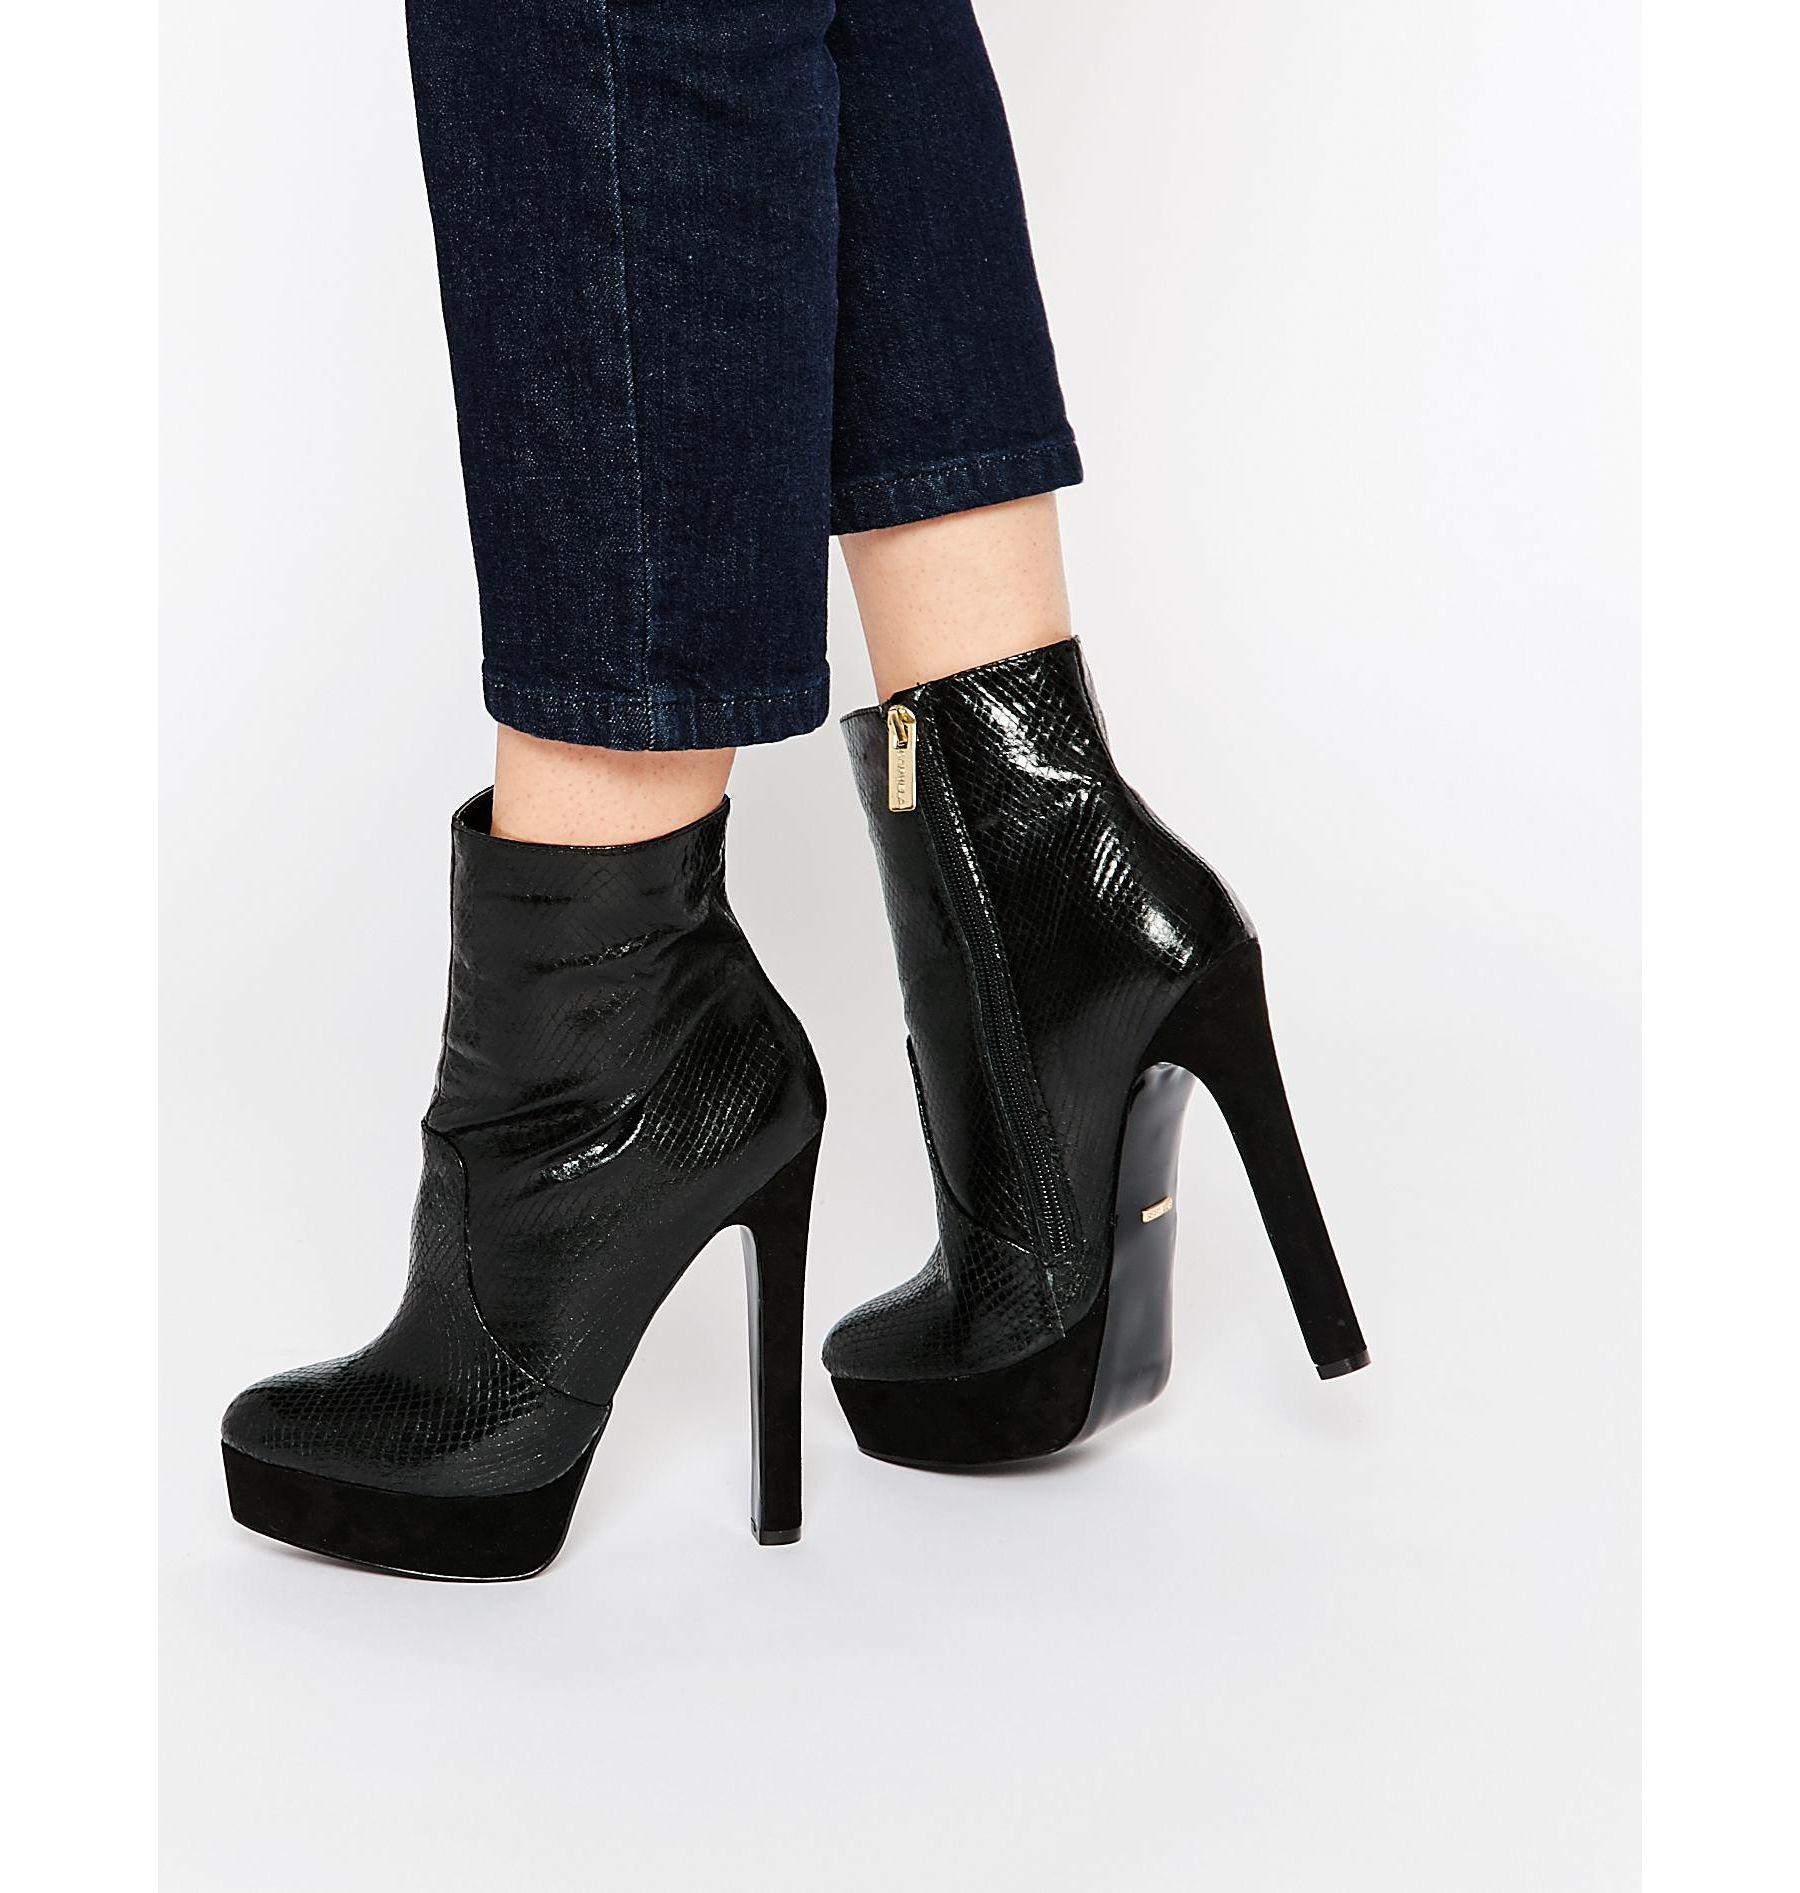 Buy Women Shoes / Carvela Sizzle Black Snake Effect Platform 70's Boots